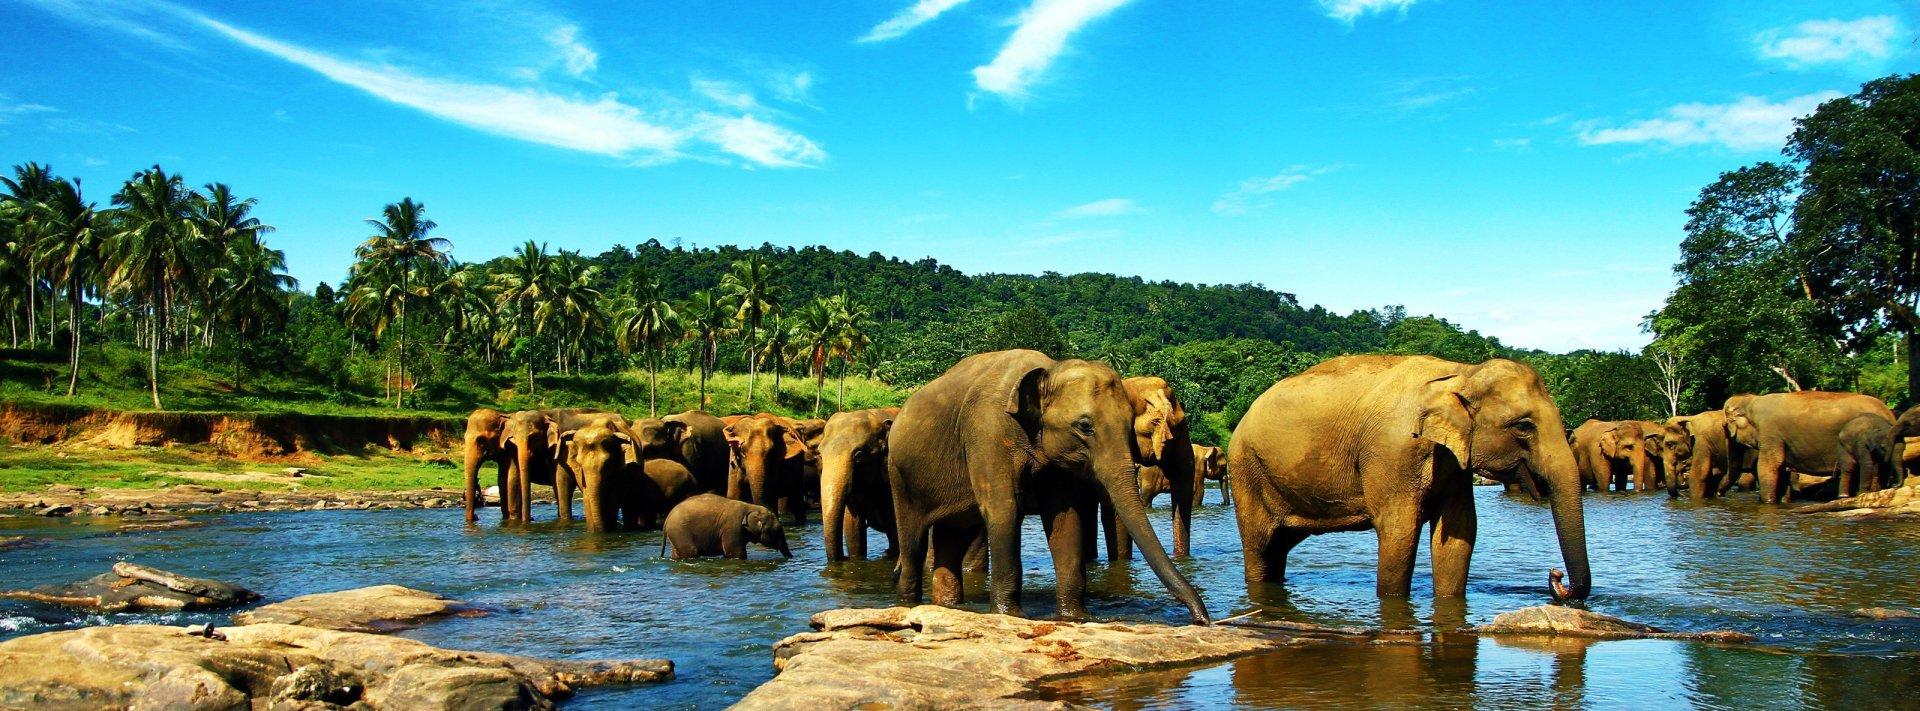 Elephant hd wallpaper background image 3200x1185 id - 2 screen wallpaper nature ...